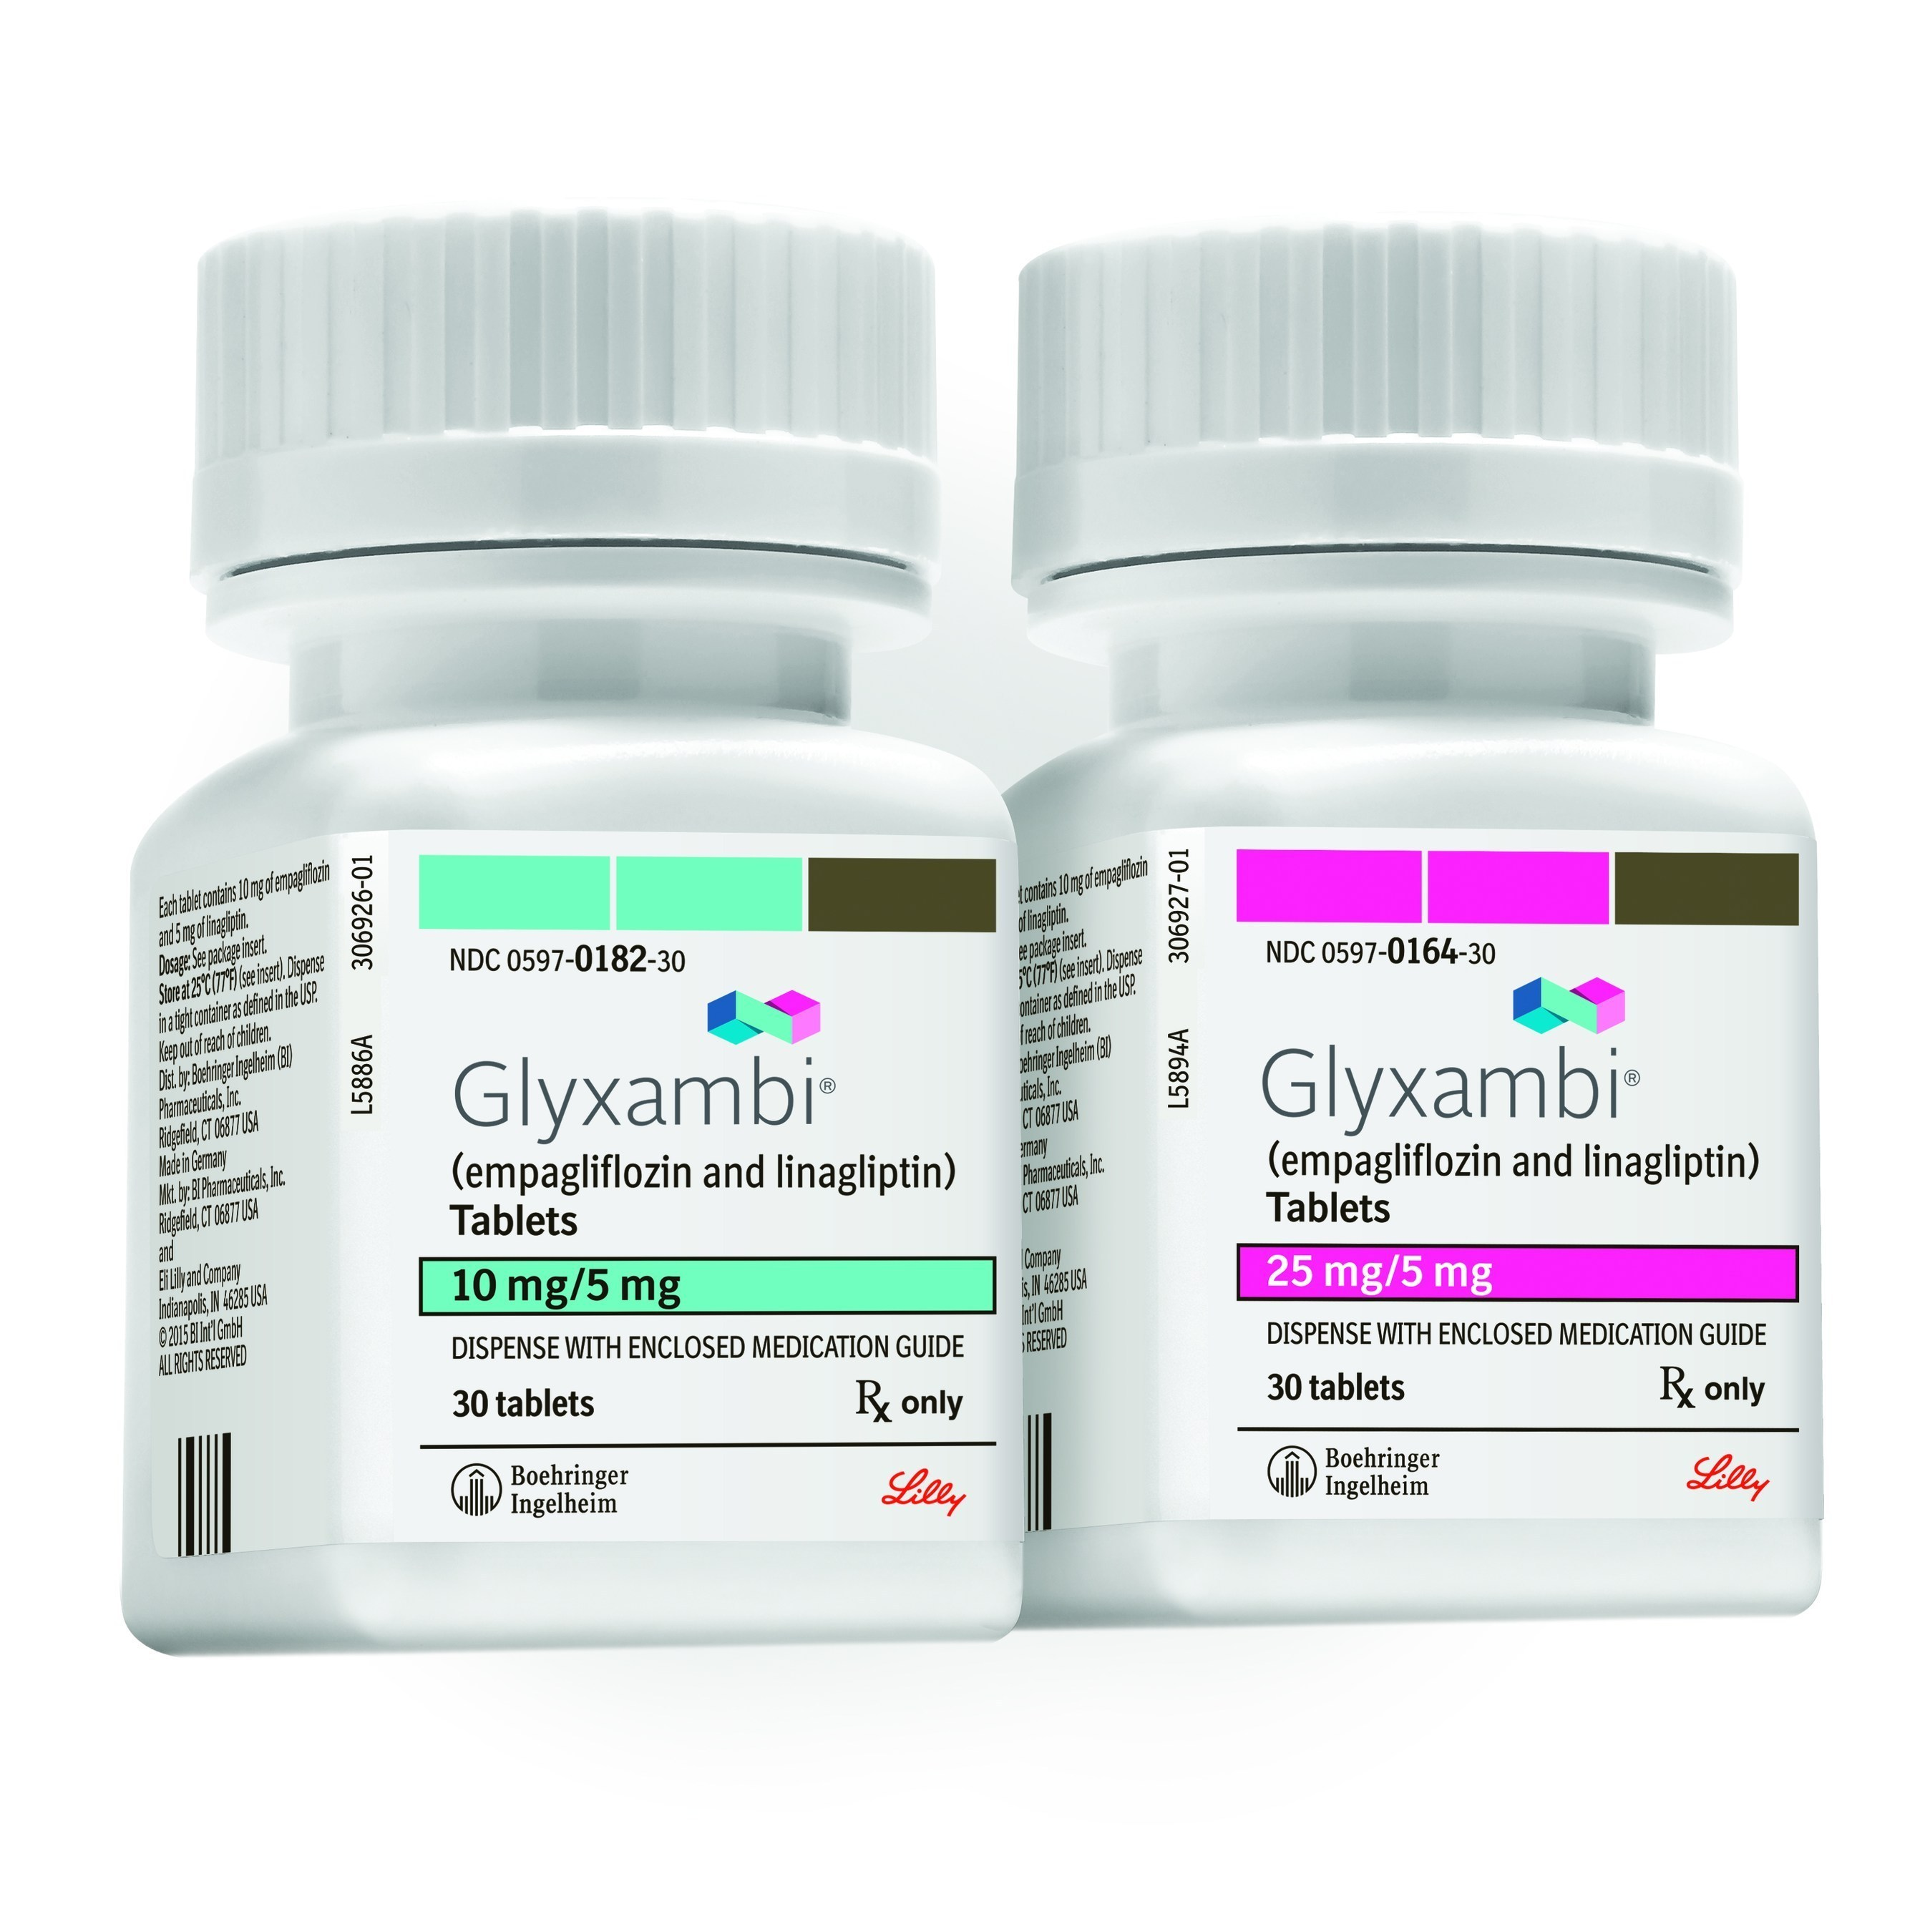 Glyxambi® (empagliflozin/linagliptin) tablet packaging 10/5 mg (left). Glyxambi® (empagliflozin/linagliptin) tablet packaging 25/5 mg (right)